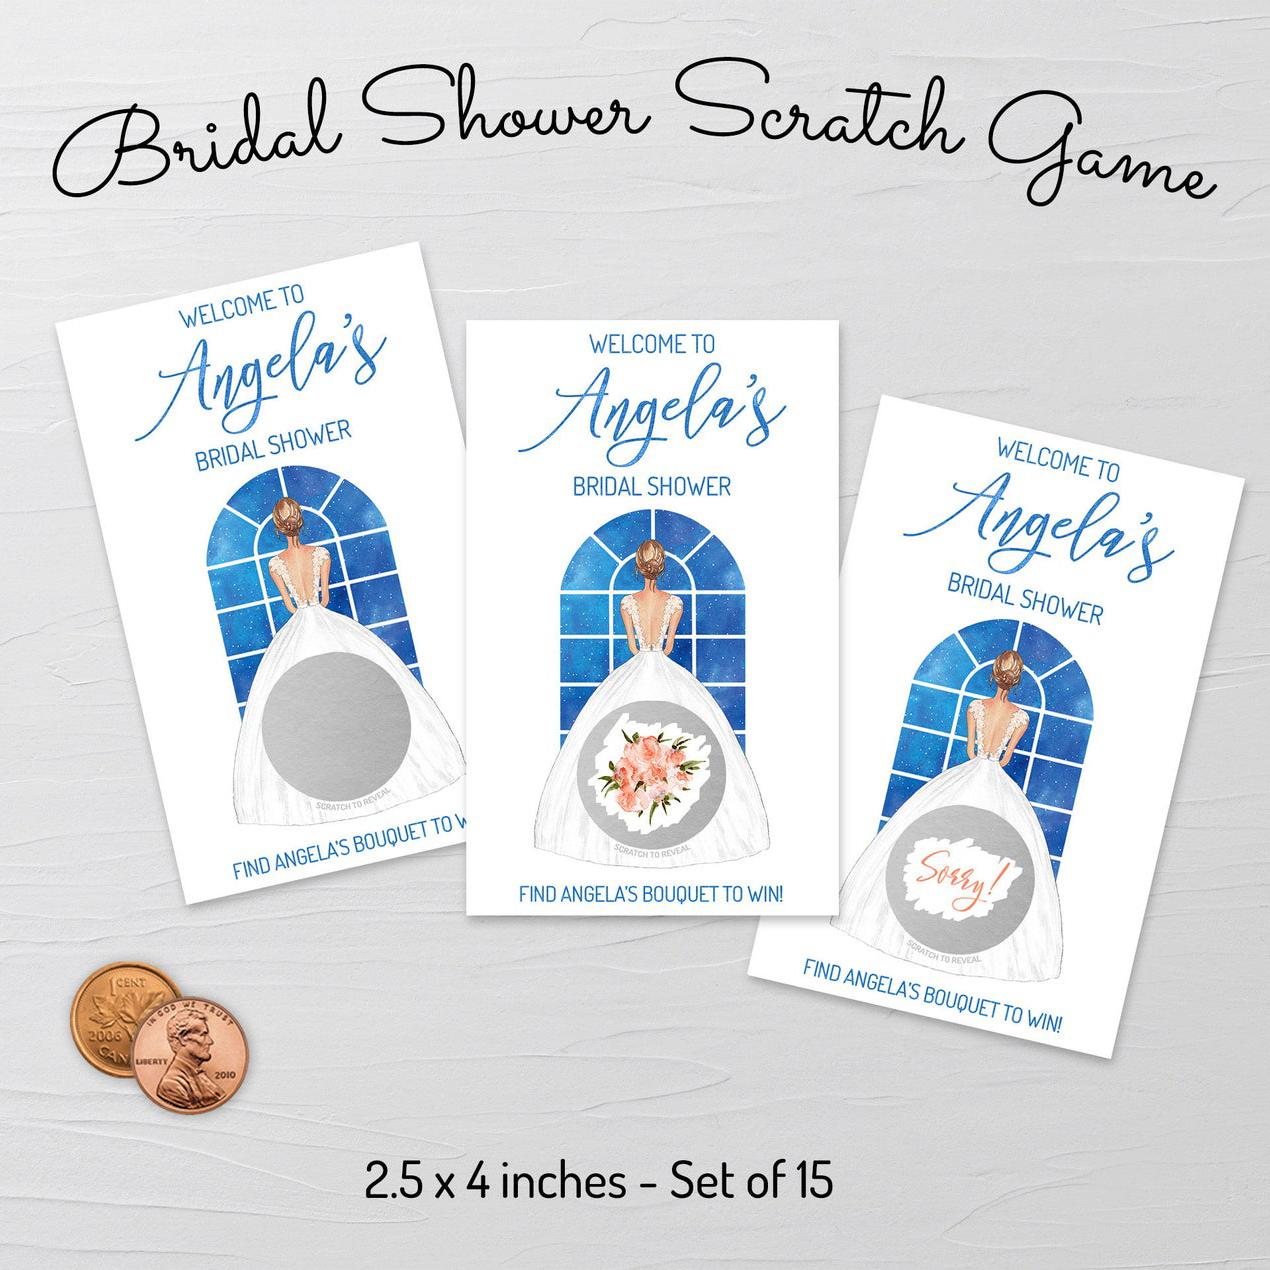 Bridal Shower Scratch Off Game